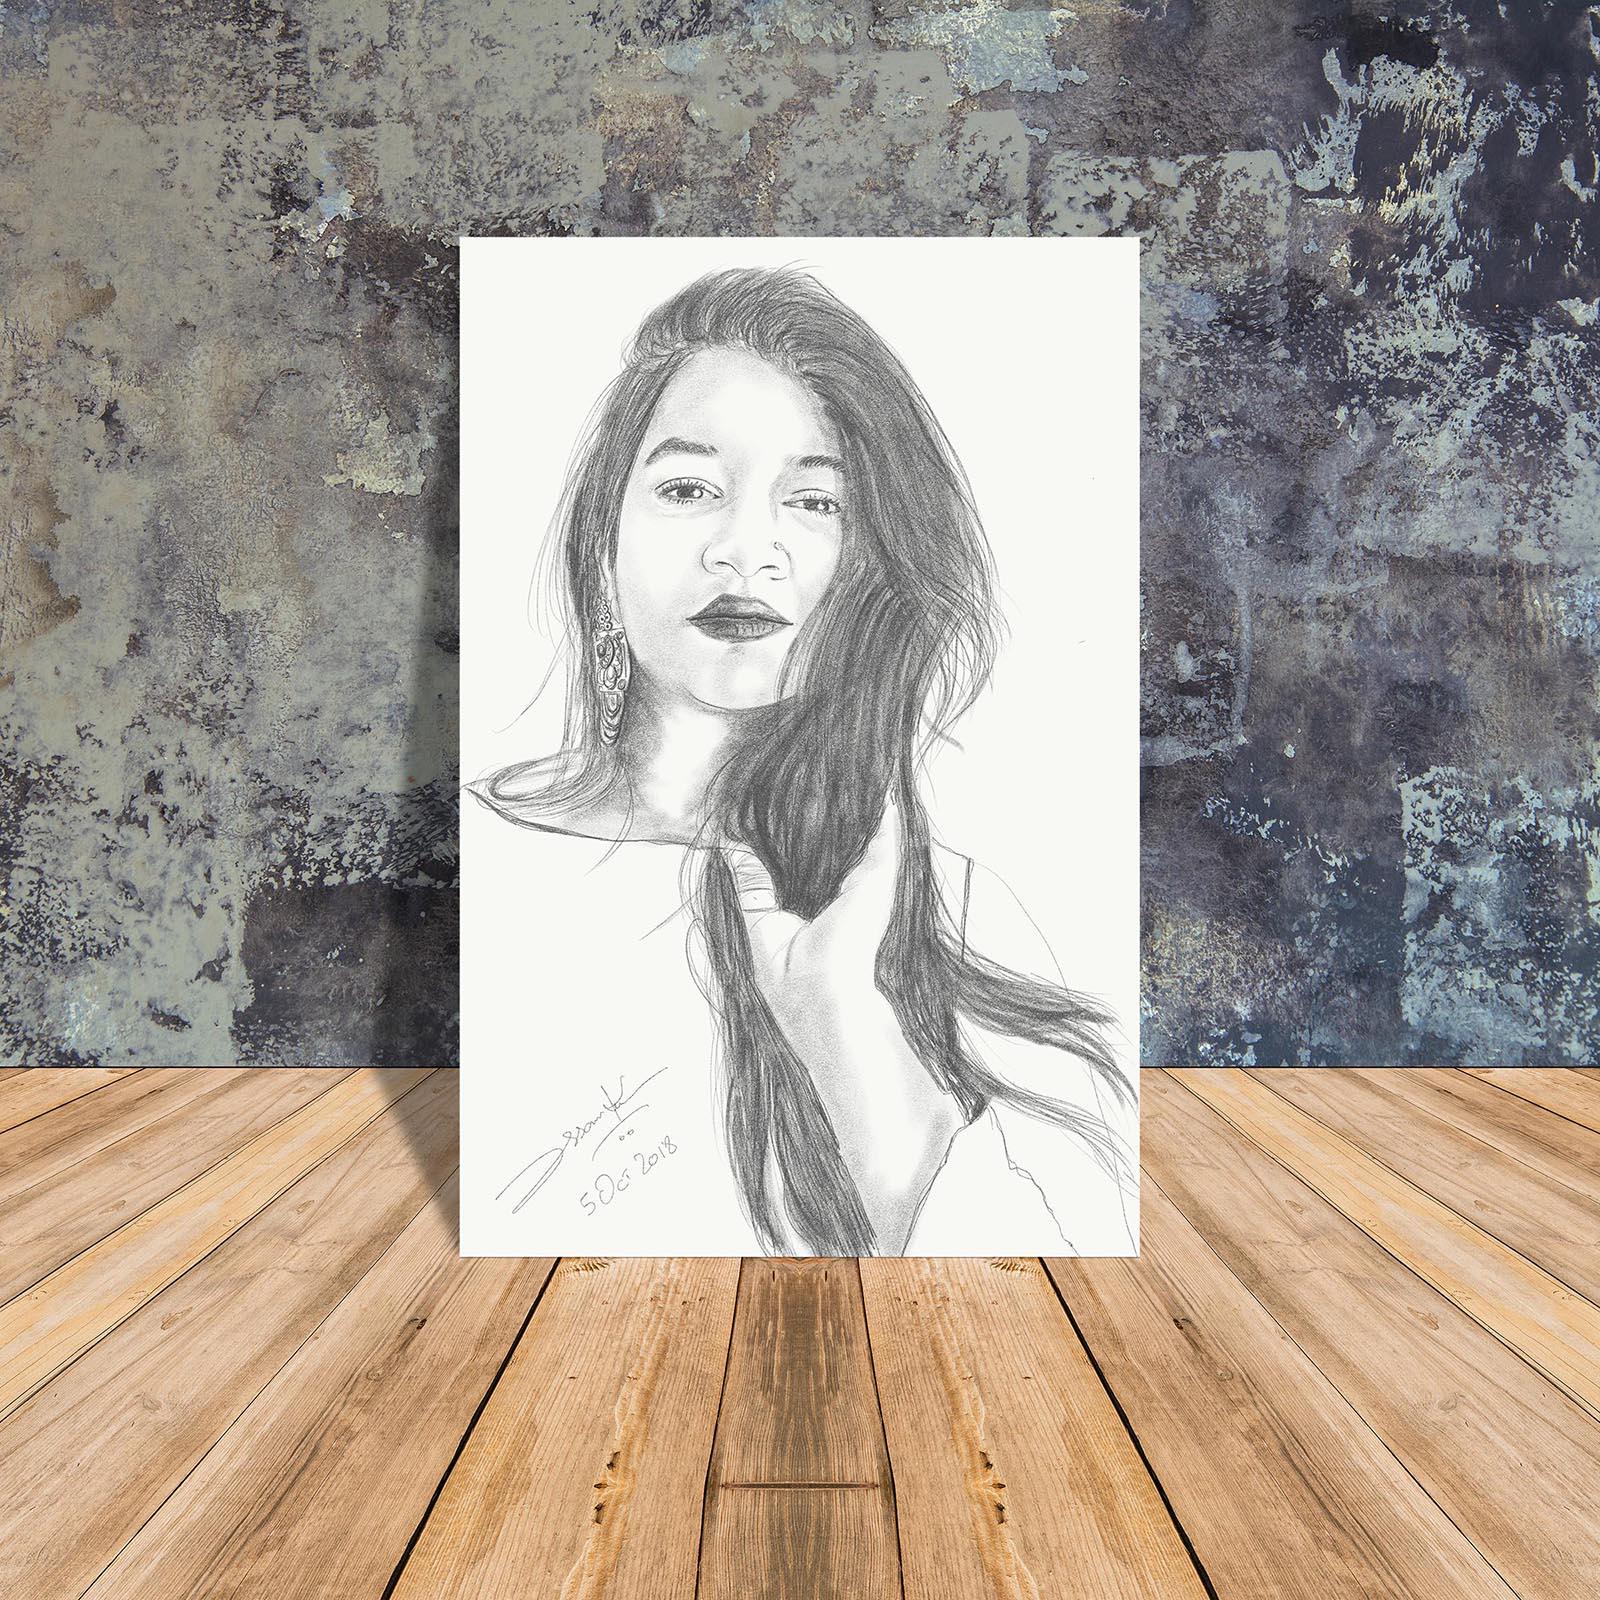 GIRL SKETCH BY ASSAM ARTIST PAKISTANI SKETCHER